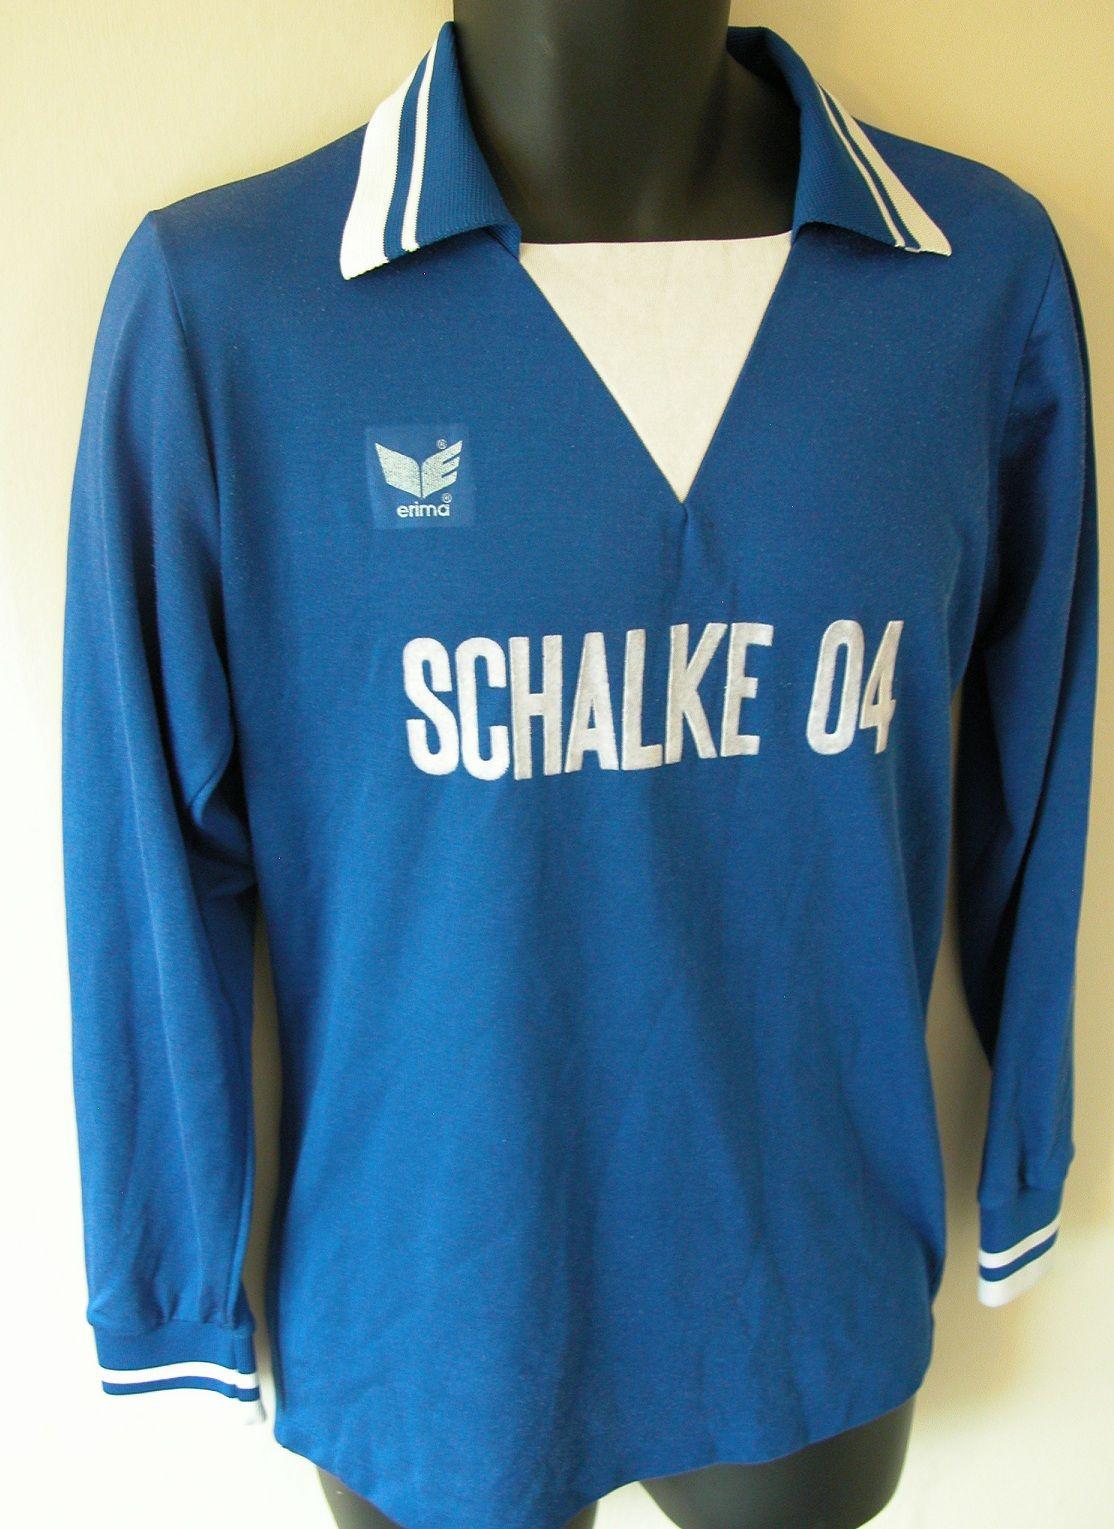 09f55d0f552 Classic 70s Schalke home shirt by Erima | No 6 - Football Kit ...